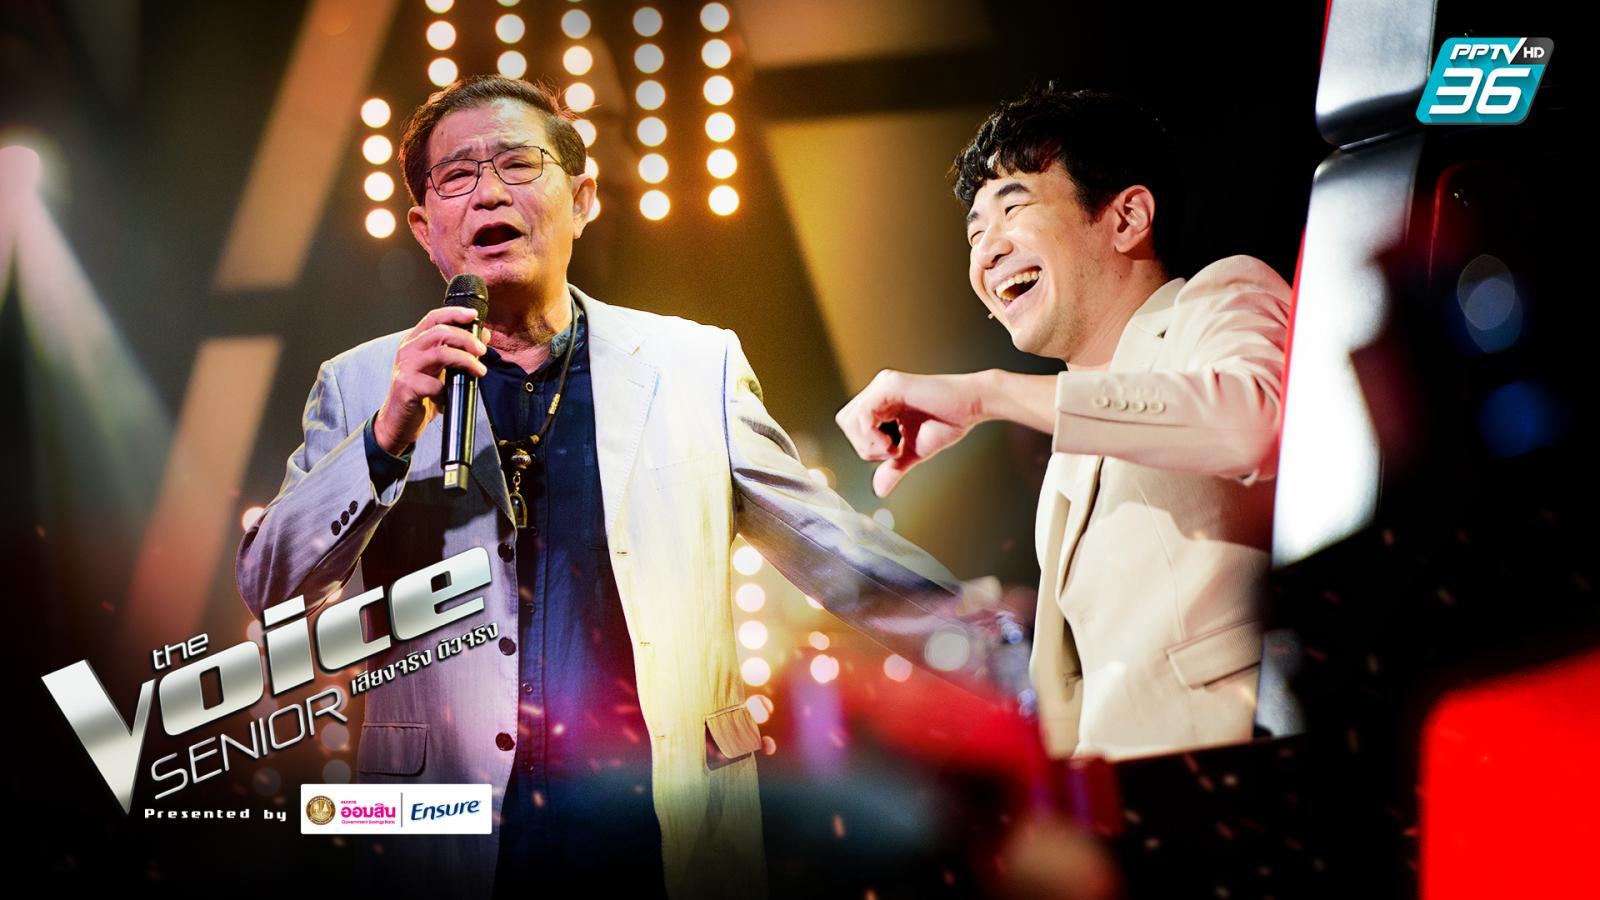 The Voice Senior Thailand 2020 EP.3 | คิดว่าโค้ชไม่กดหัน สุดท้ายเกมพลิก!